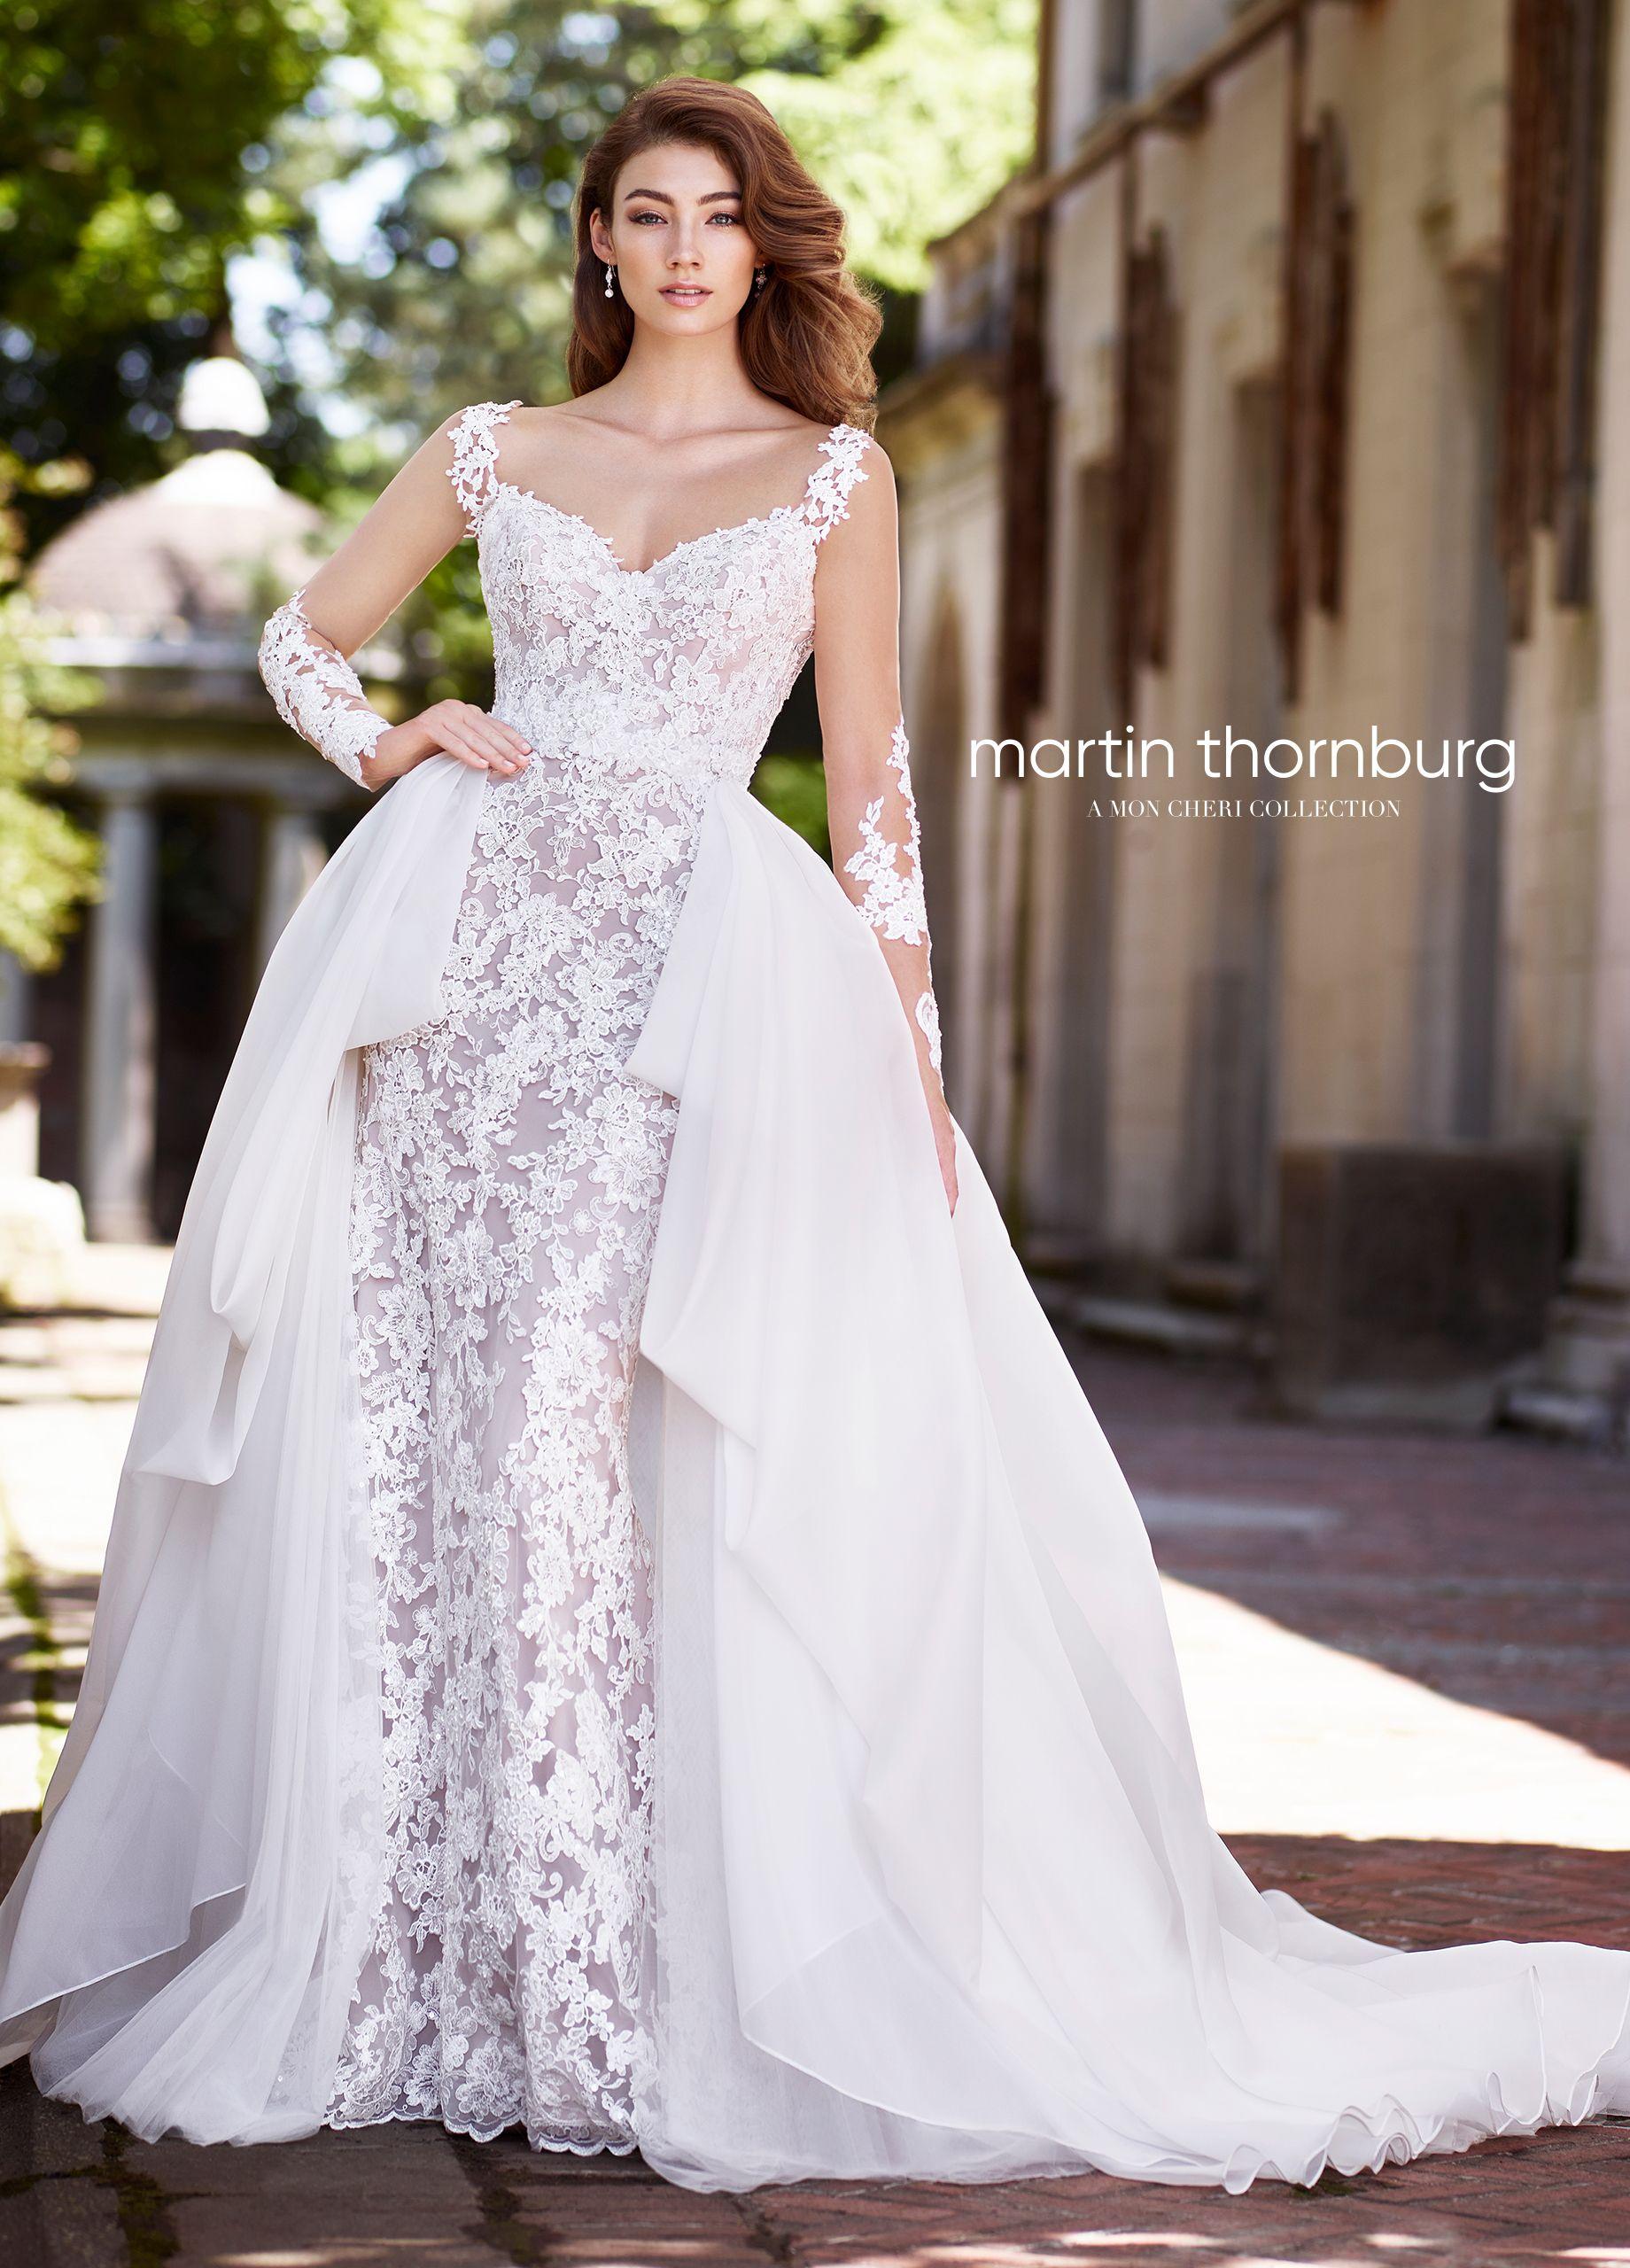 Fashion handmake Wedding Dress Fashion Clothing Gown For  dolODUS